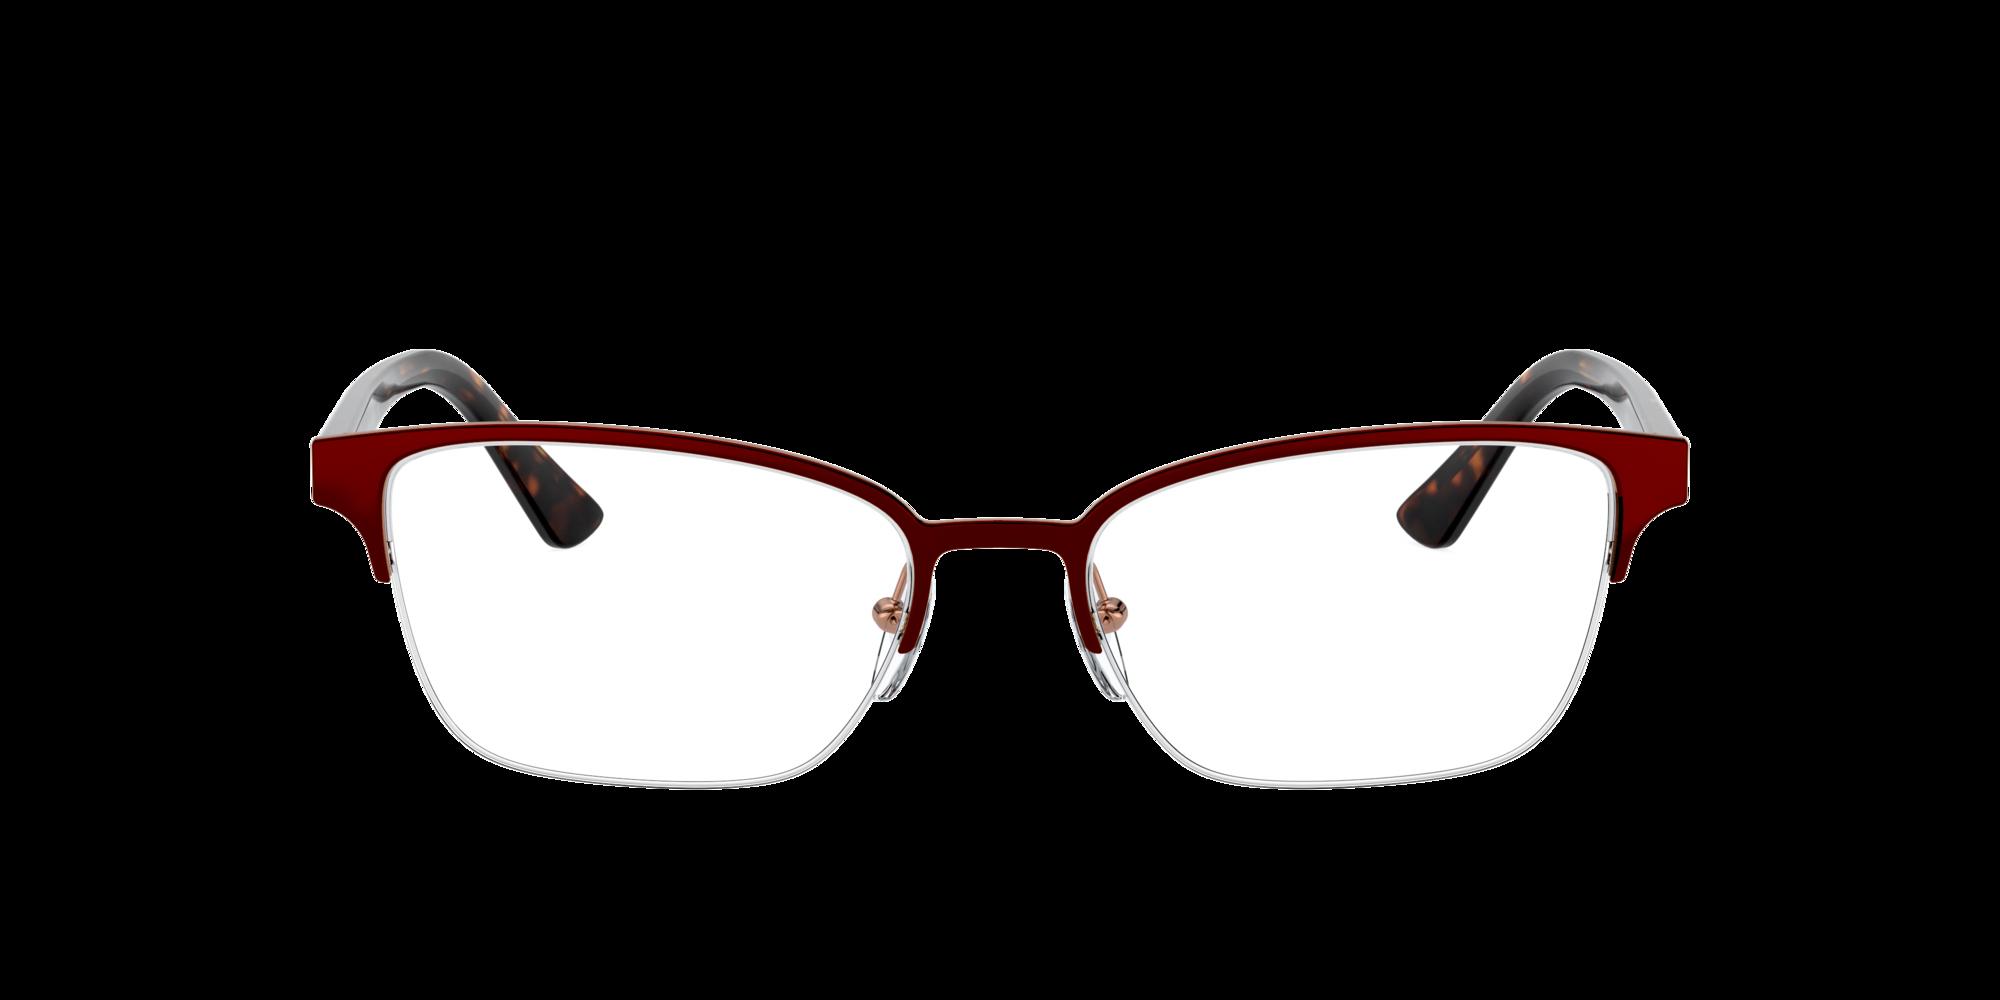 Image for PR 61XV MILLENNIALS from LensCrafters   Glasses, Prescription Glasses Online, Eyewear